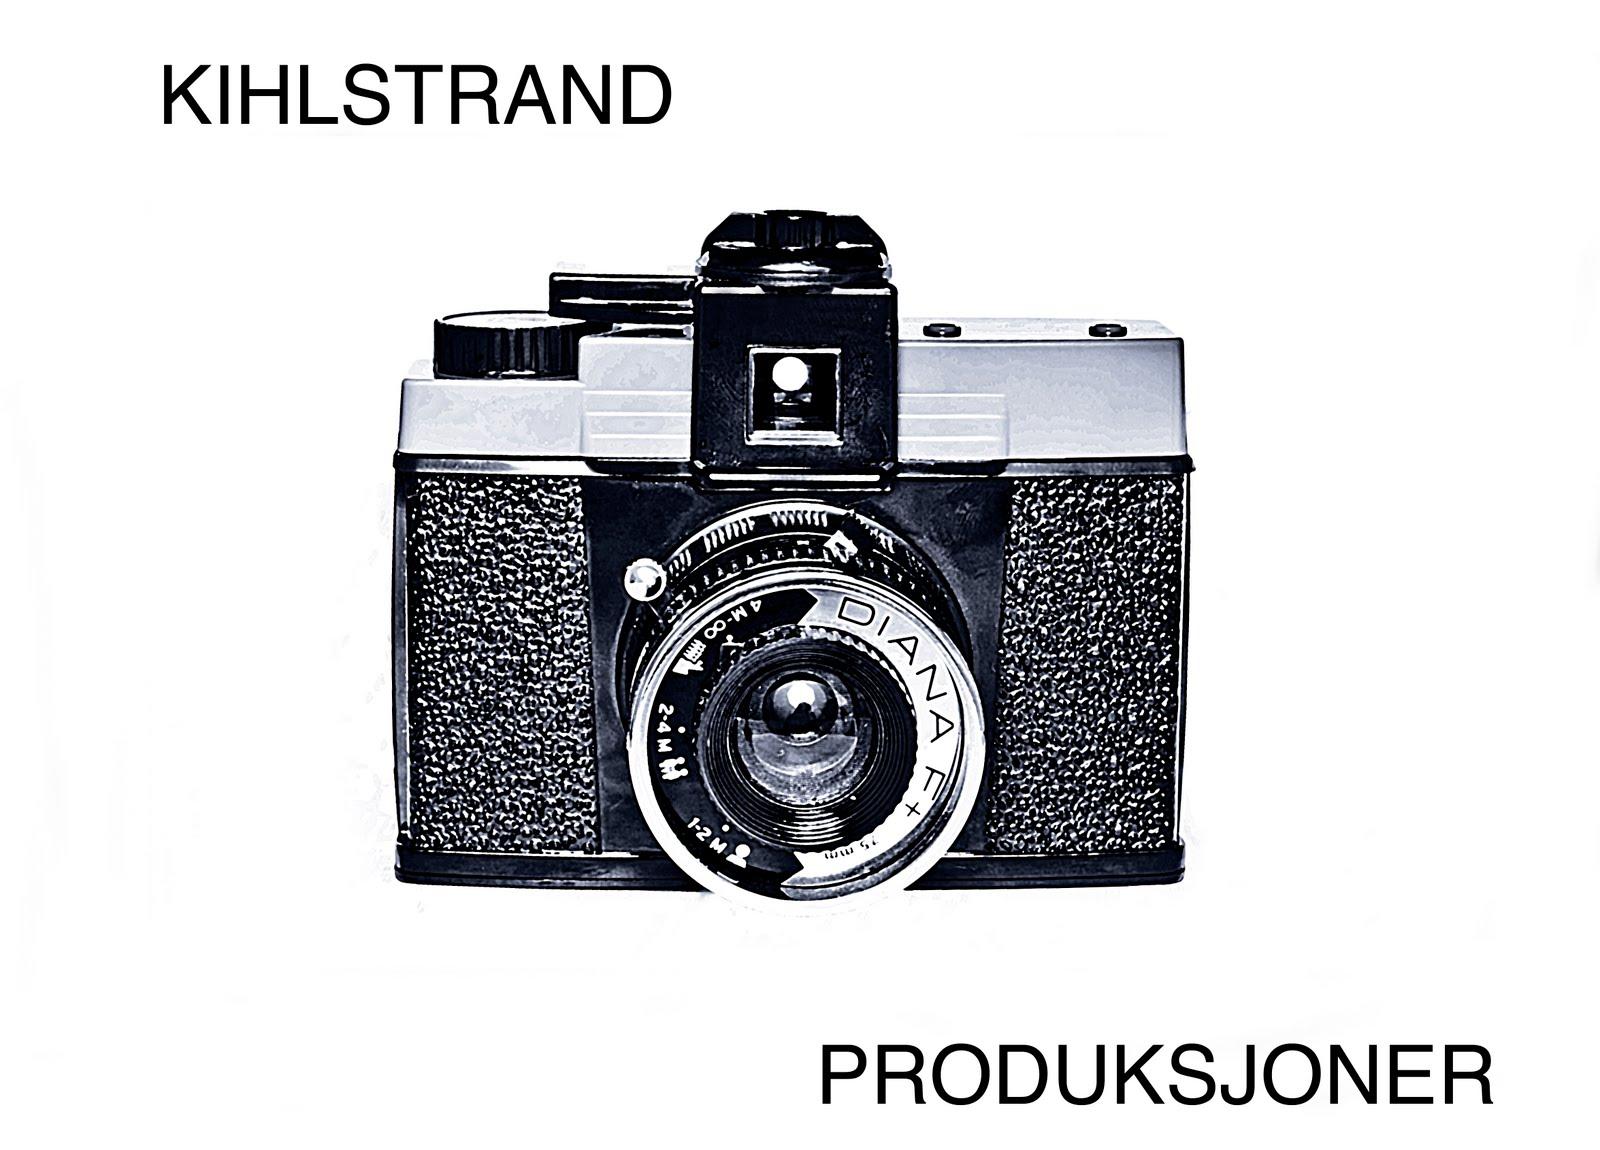 fotograf henrik kihlstrand